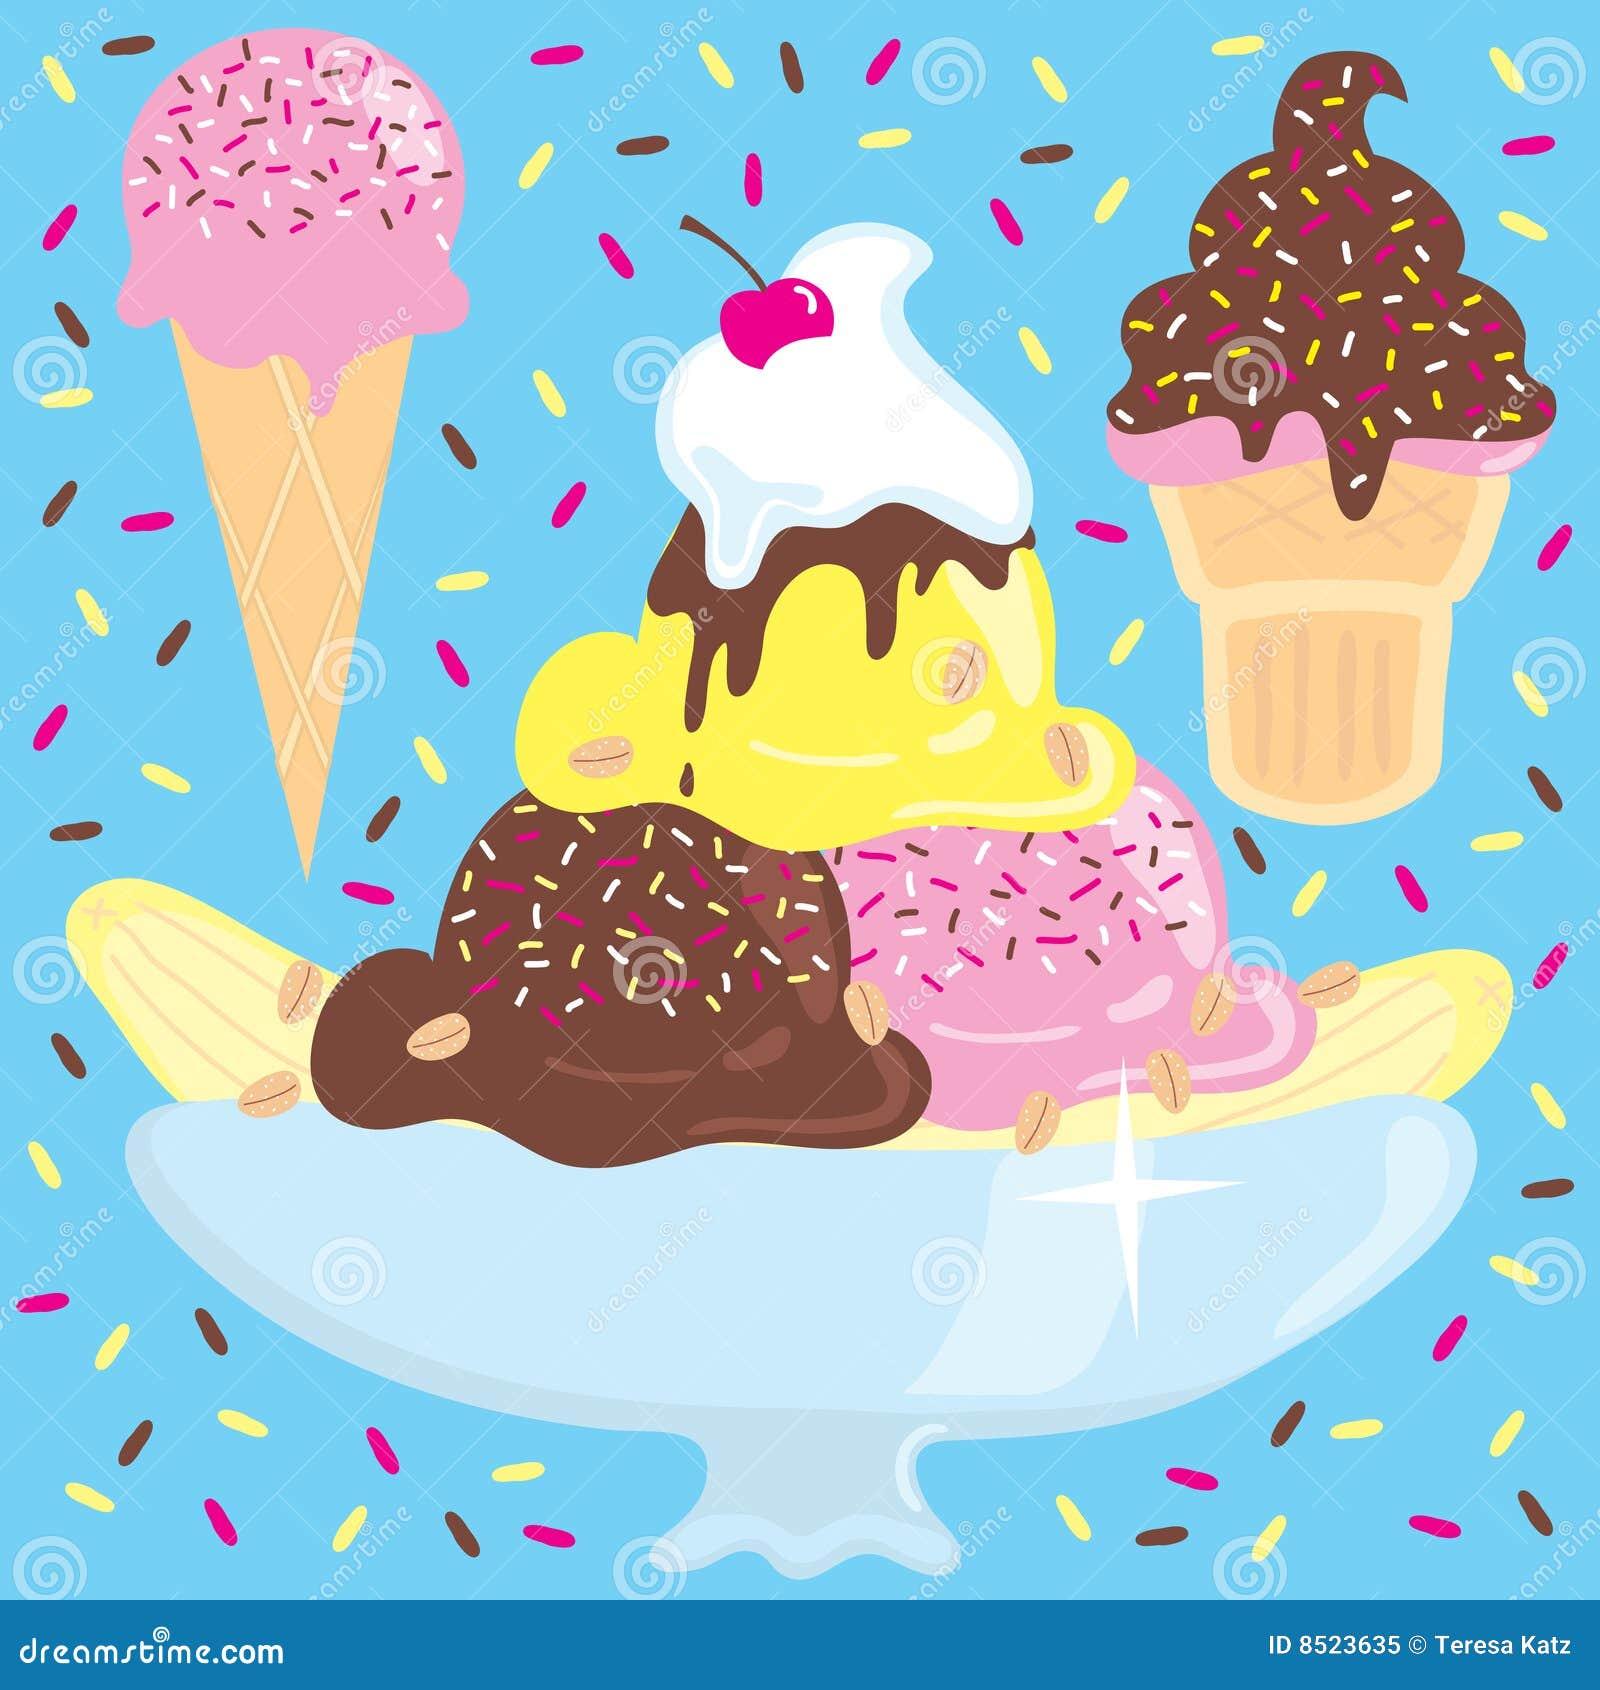 Clip Art Ice Cream Sundae Clip Art sundae stock illustrations 3087 ice cream with cones royalty free photo